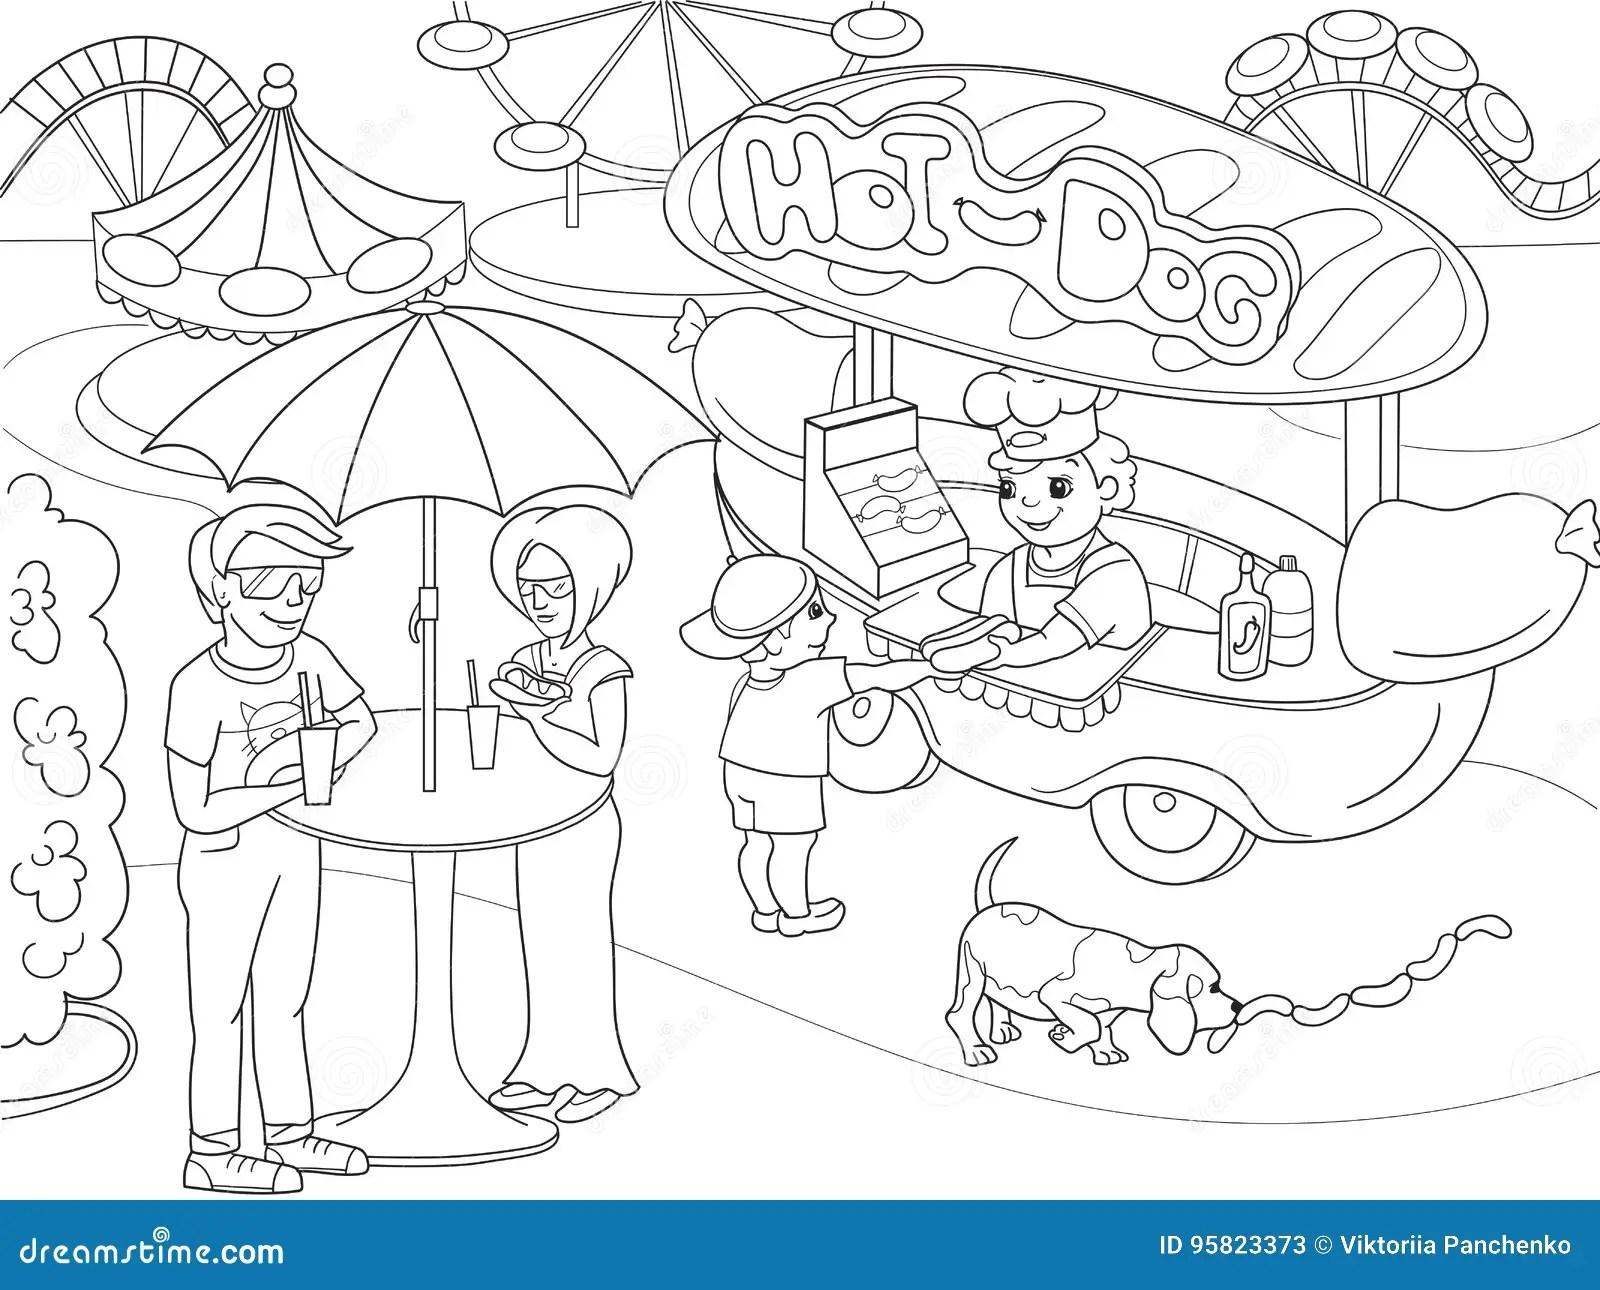 Amusement Park Coloring Pages For Children Hot Dog Food